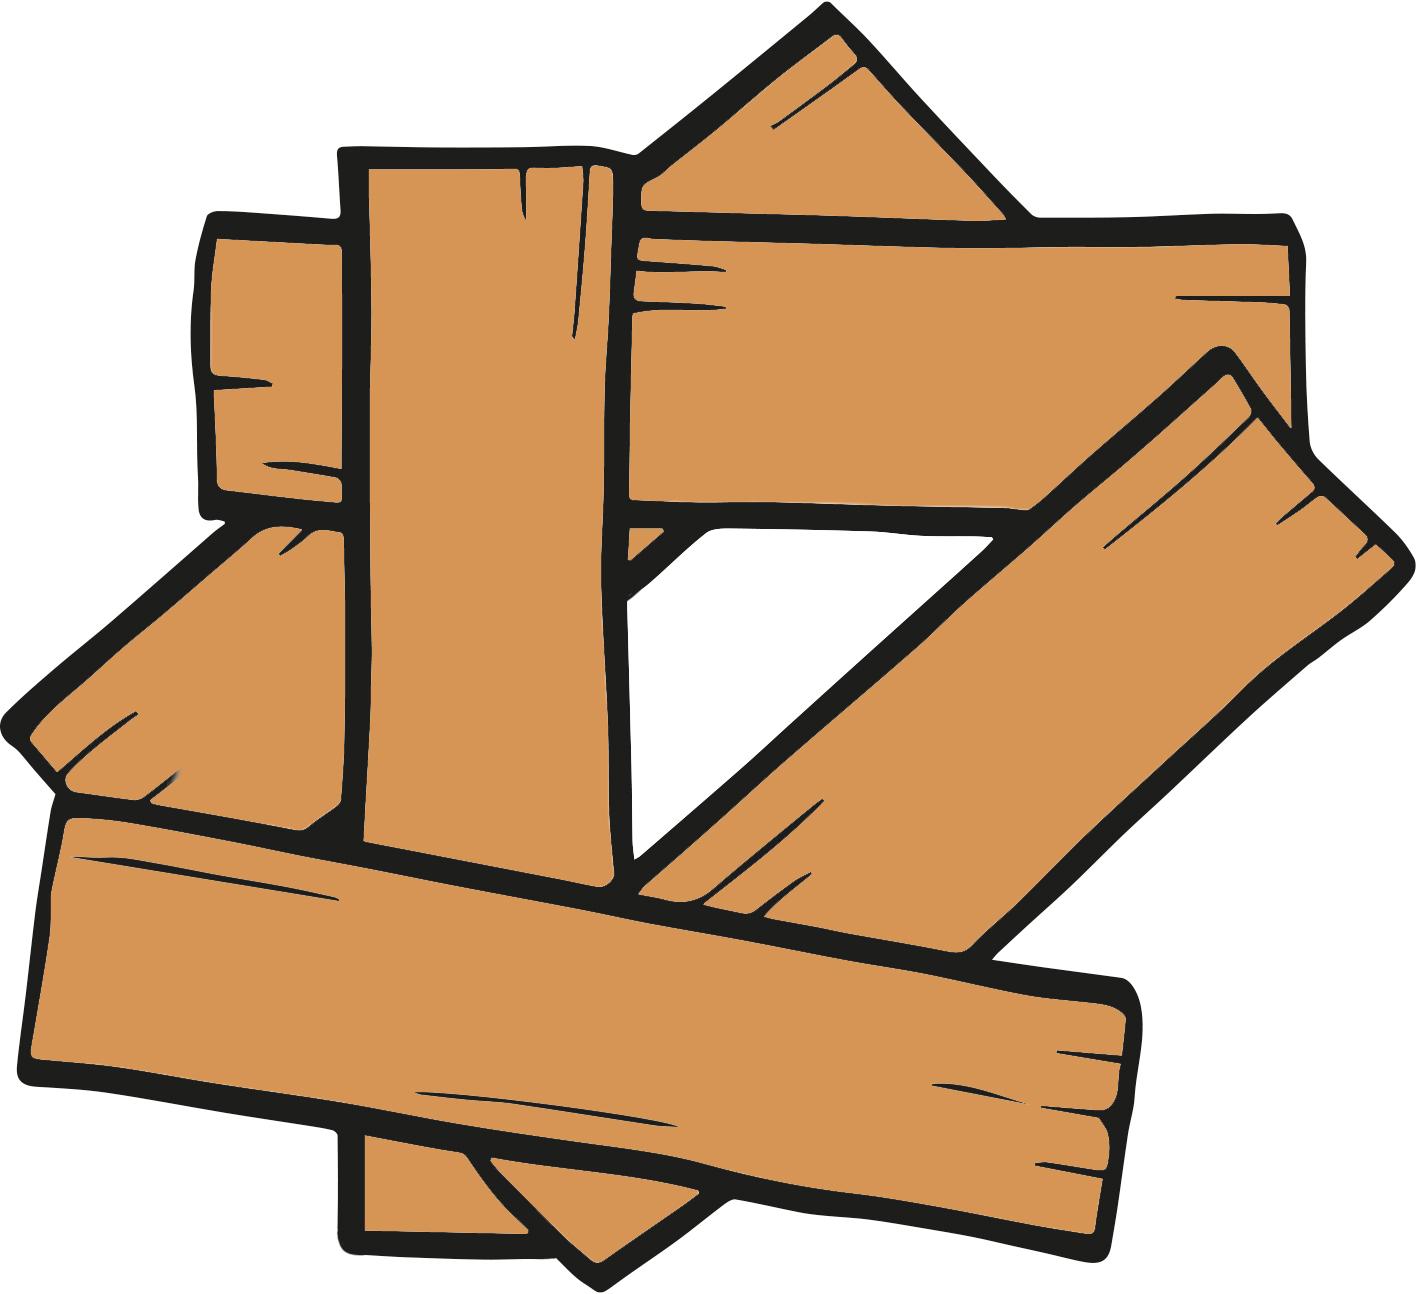 illustration of planks of wood